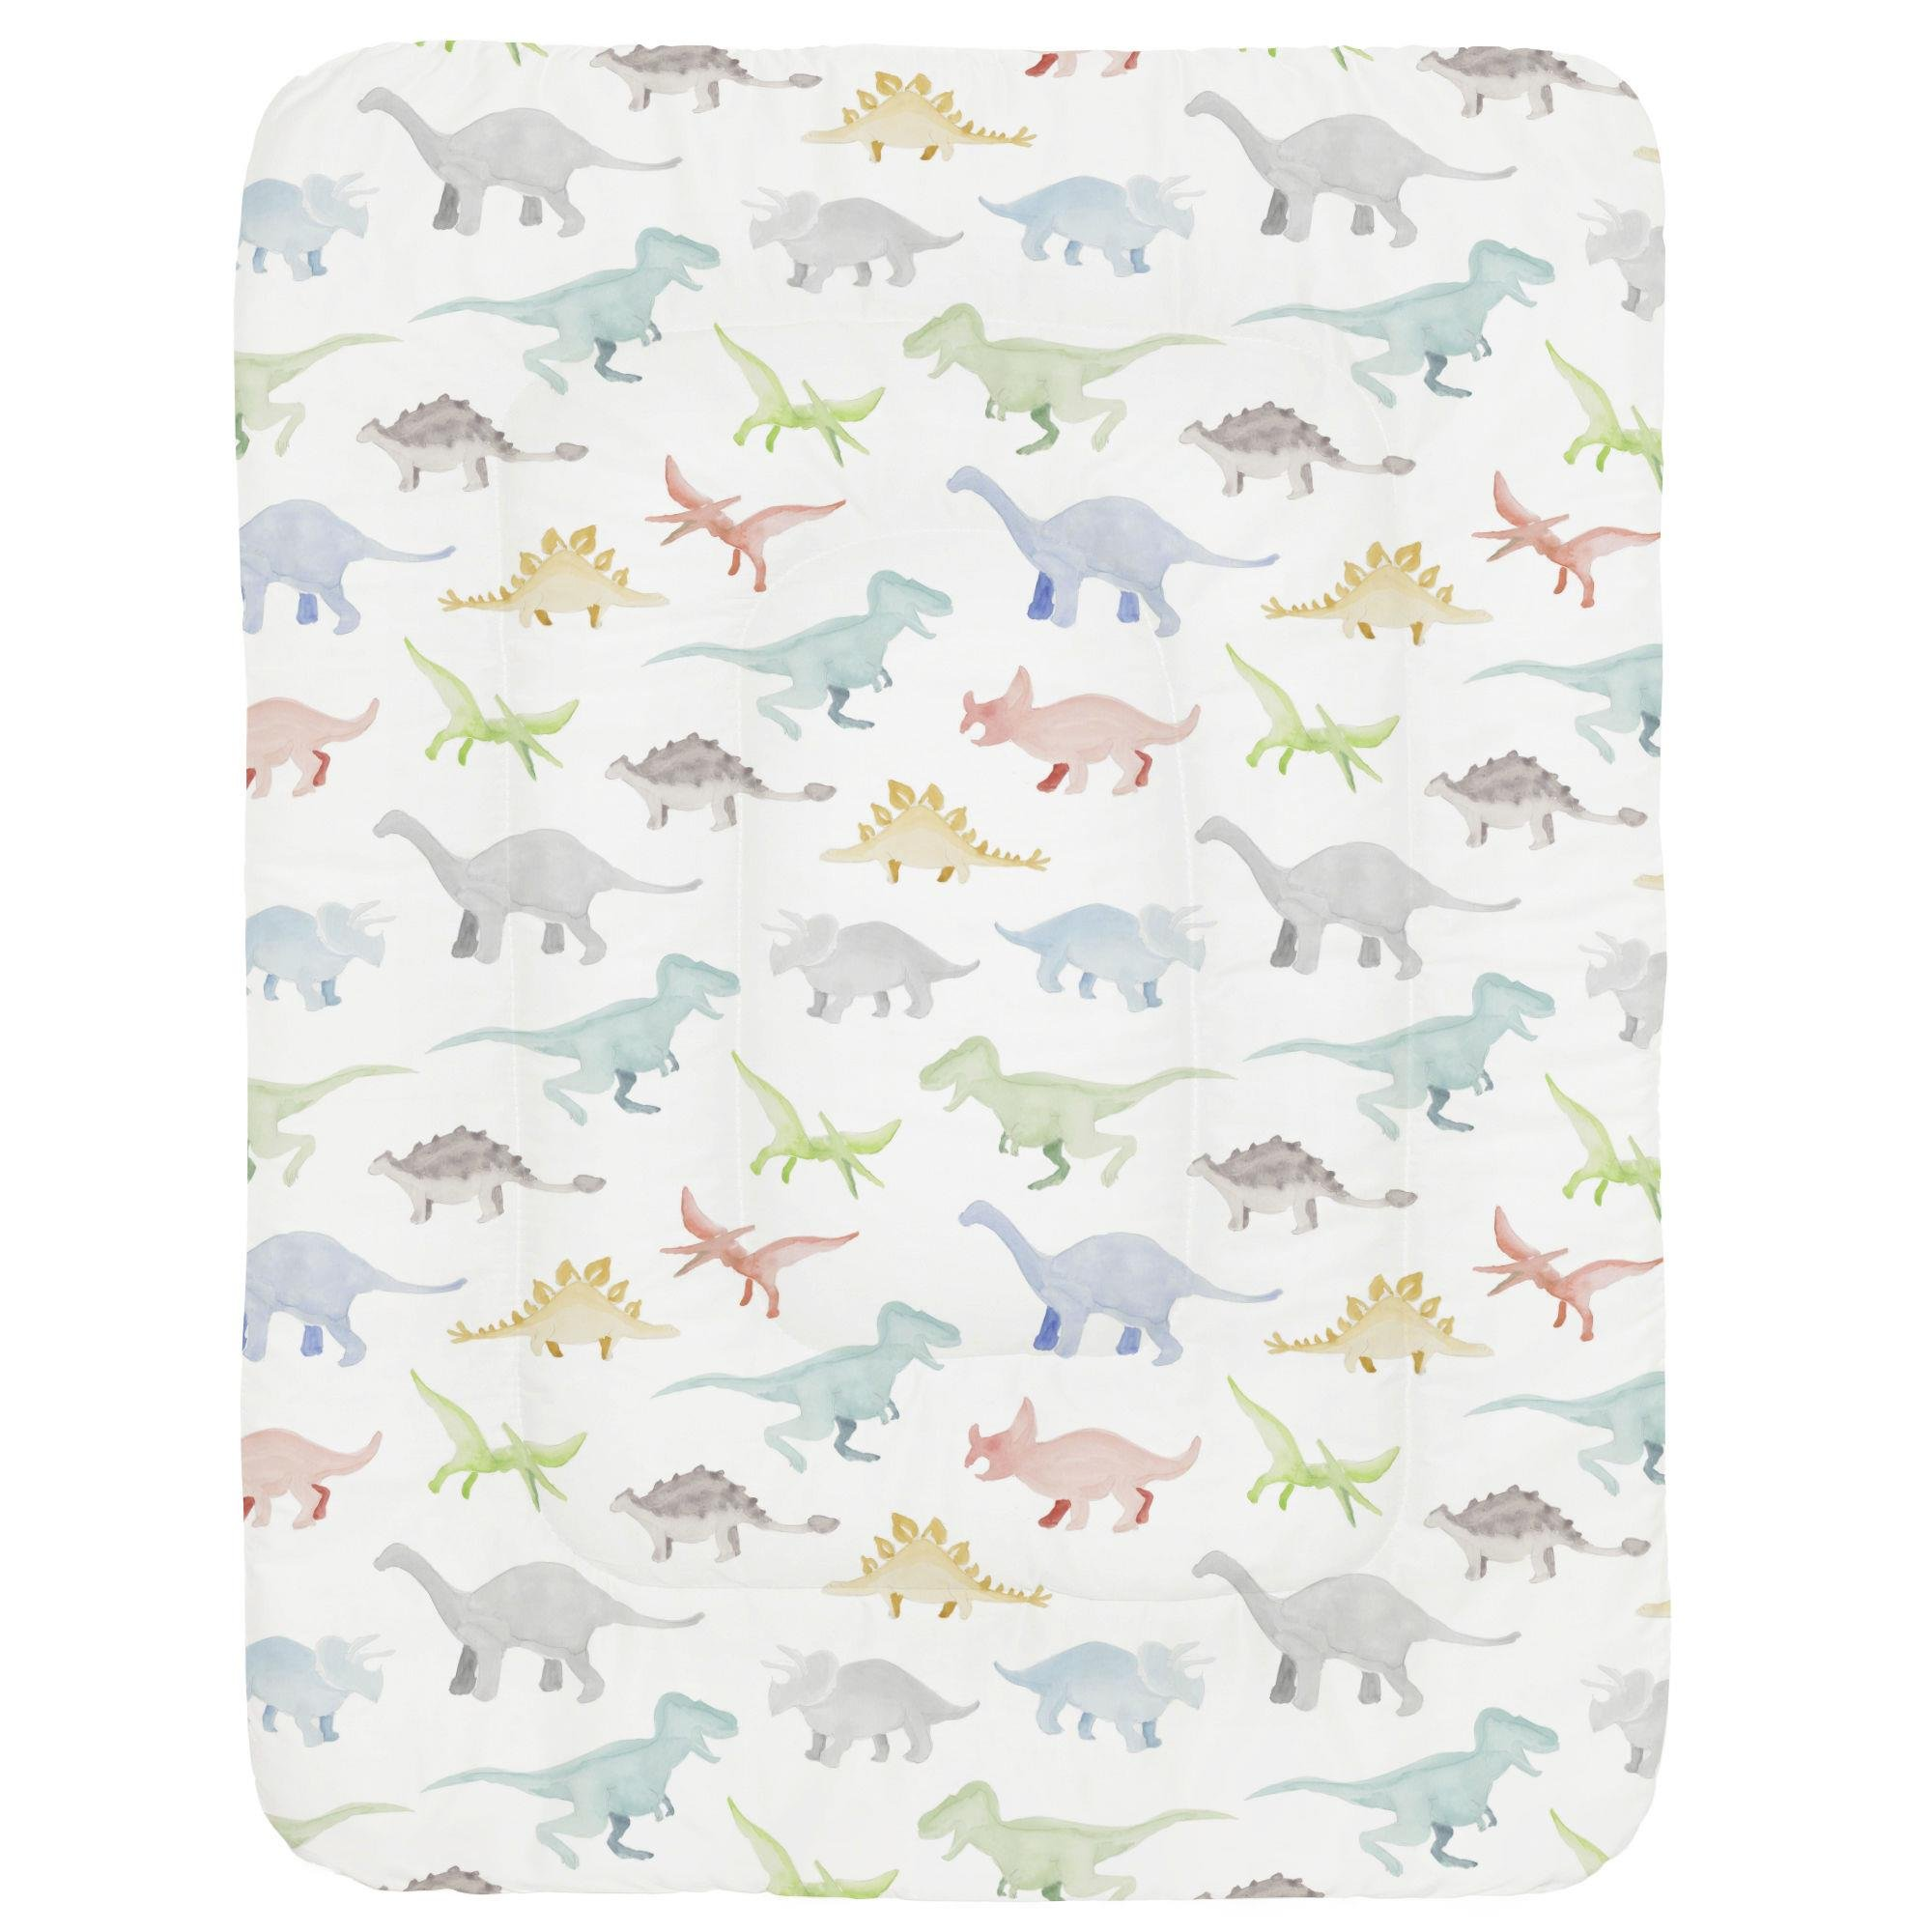 Carousel Designs Watercolor Dinosaurs Crib Comforter